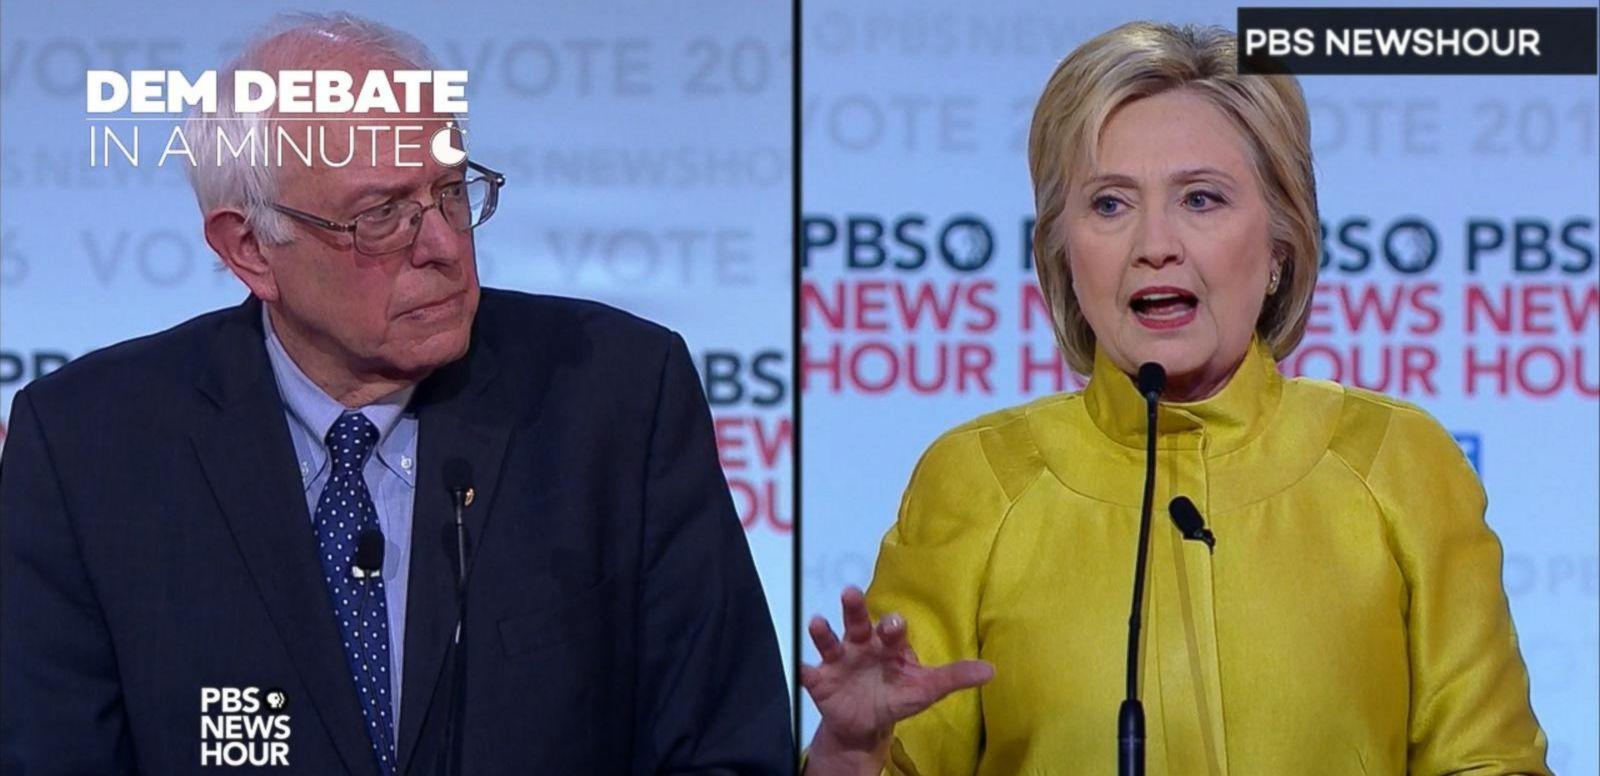 VIDEO: Sixth Democratic Presidential Debate In A Minute